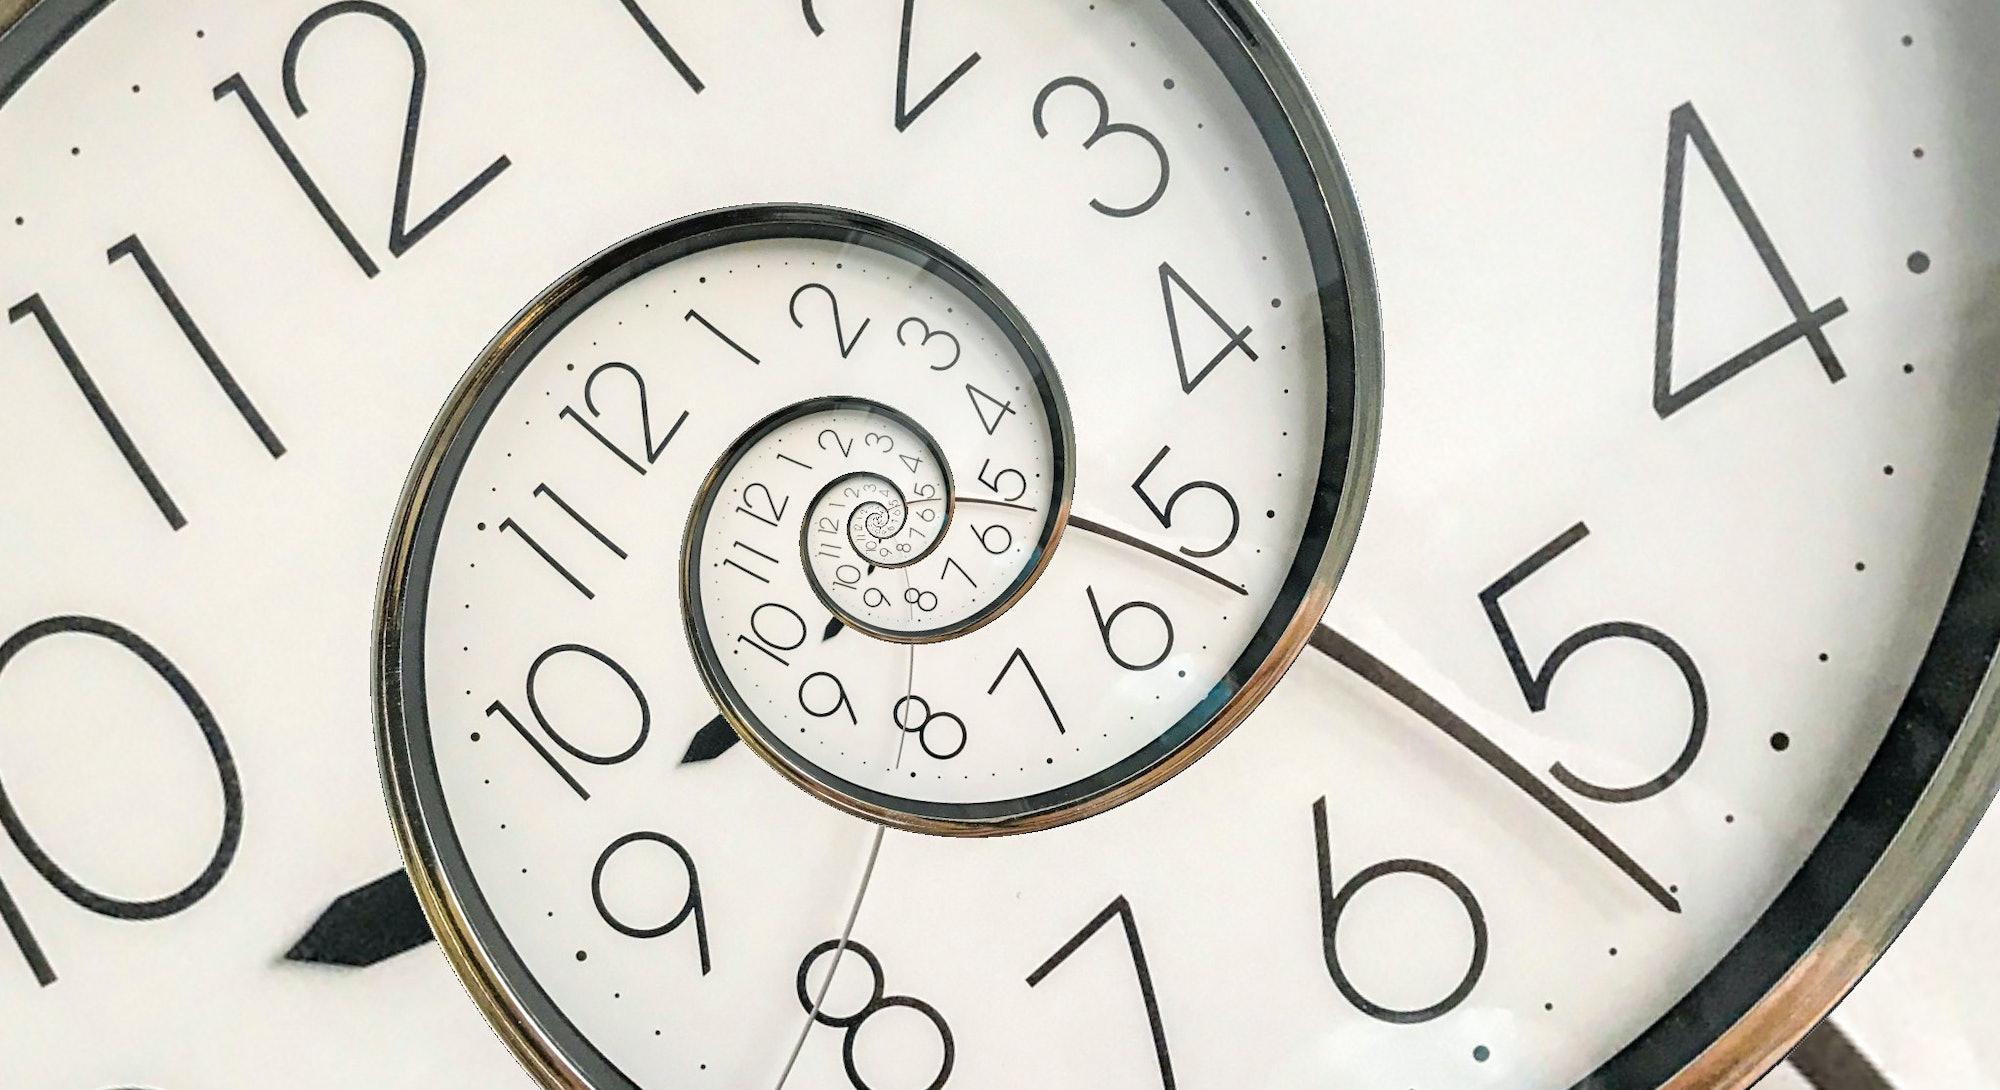 illustration of clock spiraling infinitely inward